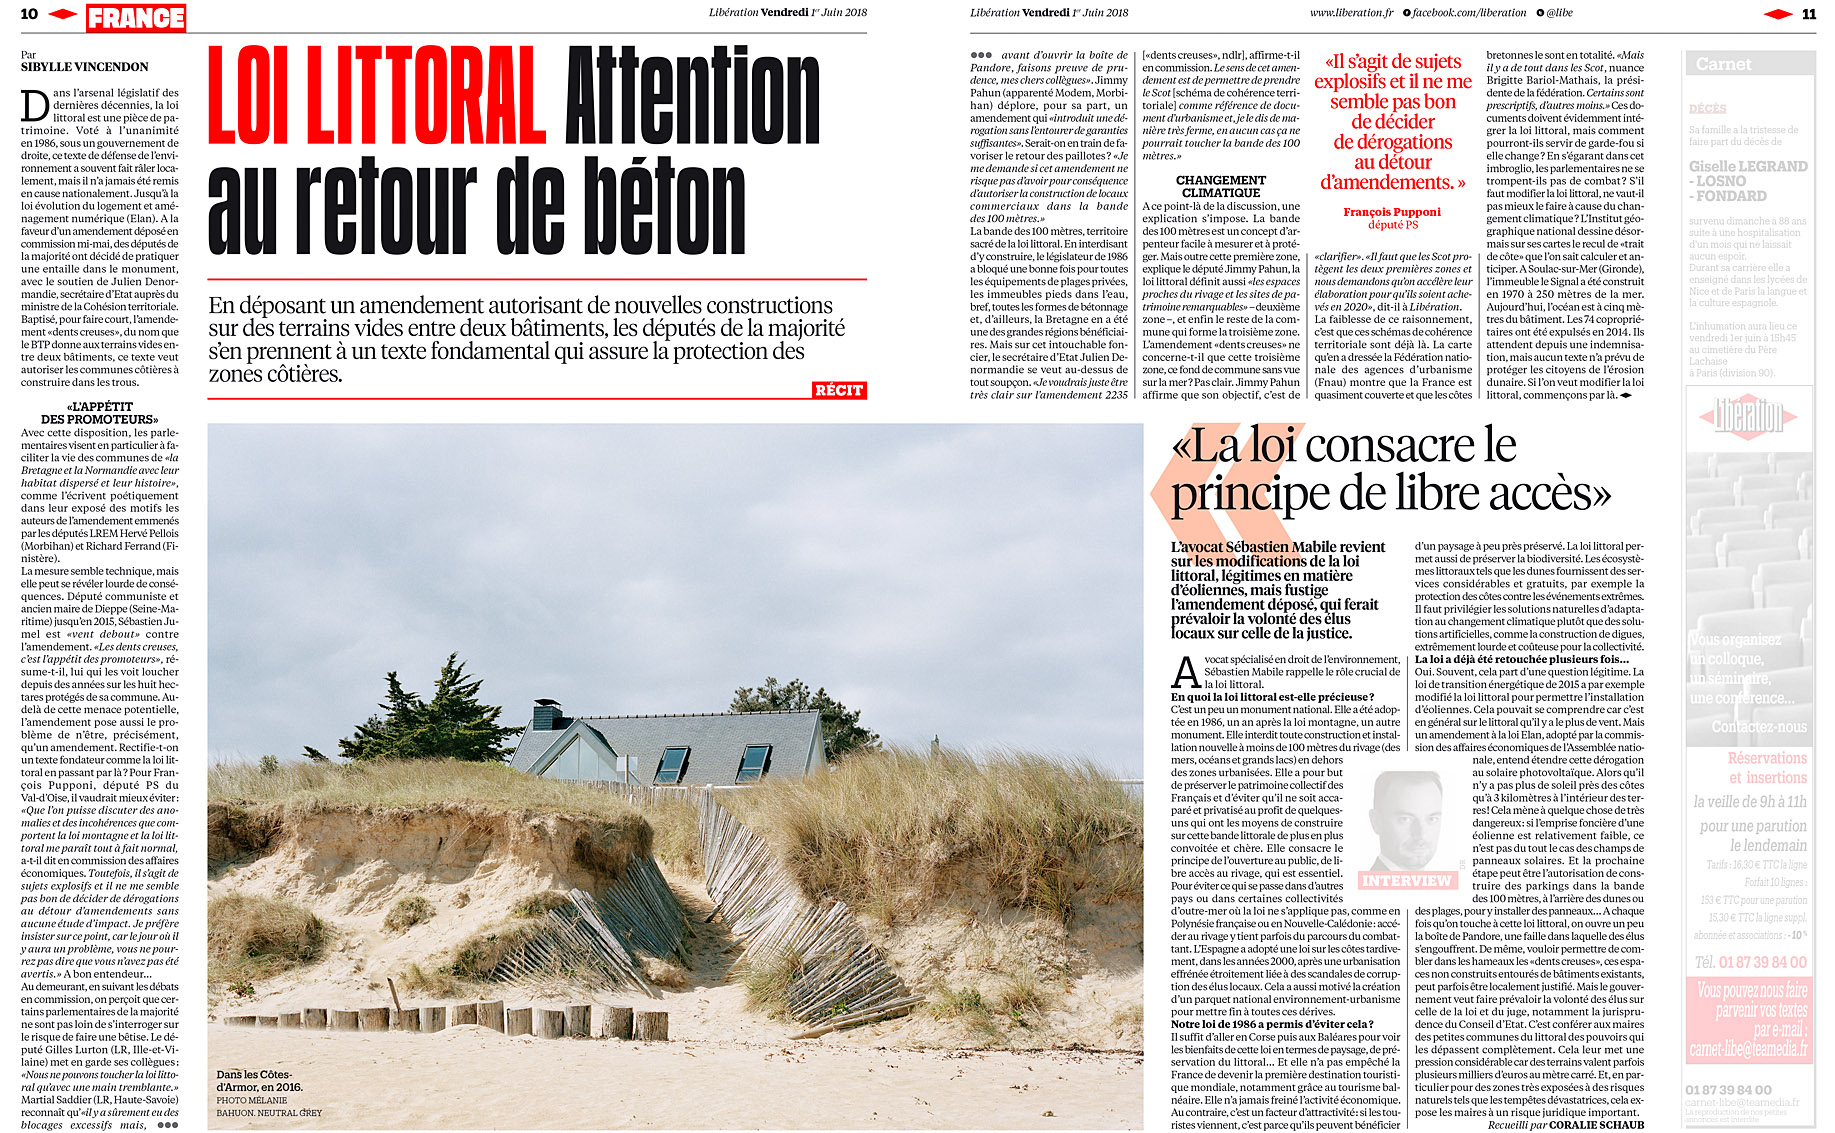 Libération du 1er juin 2018.